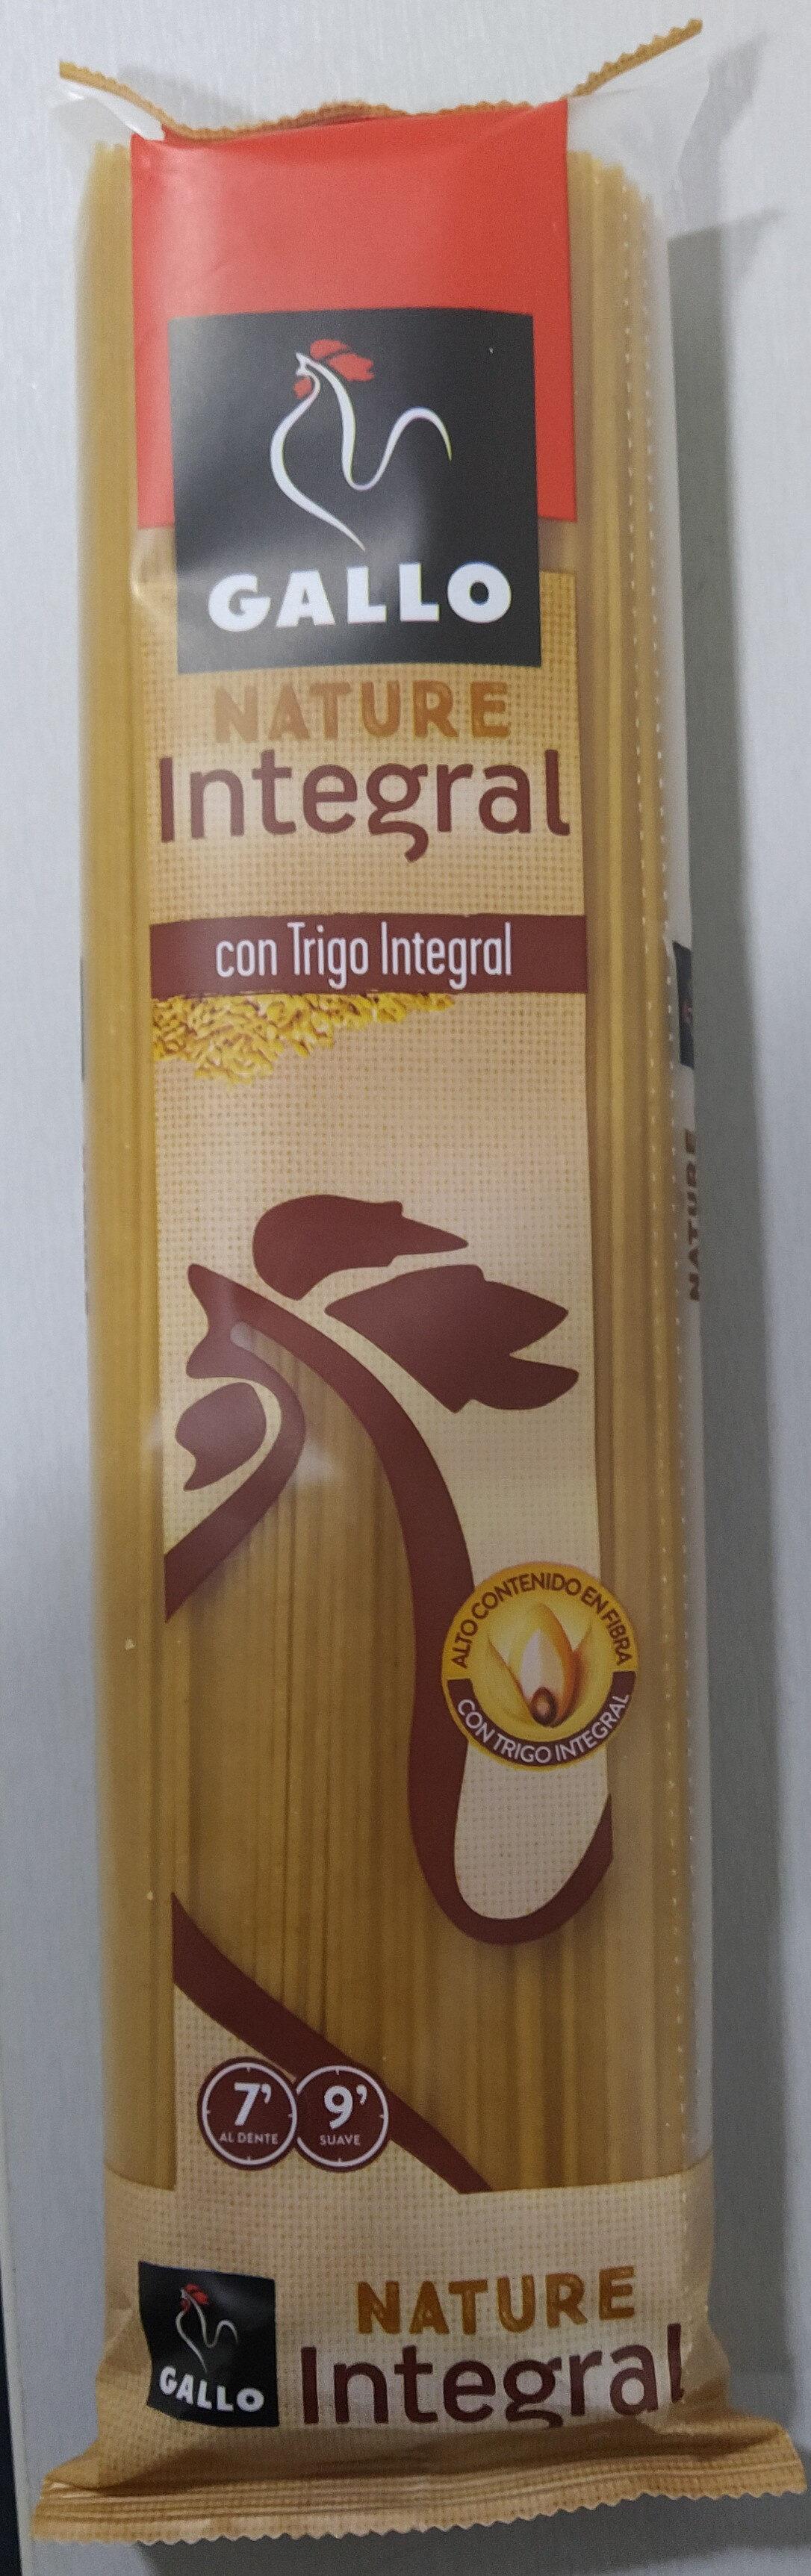 Nature Integral - Producto - es